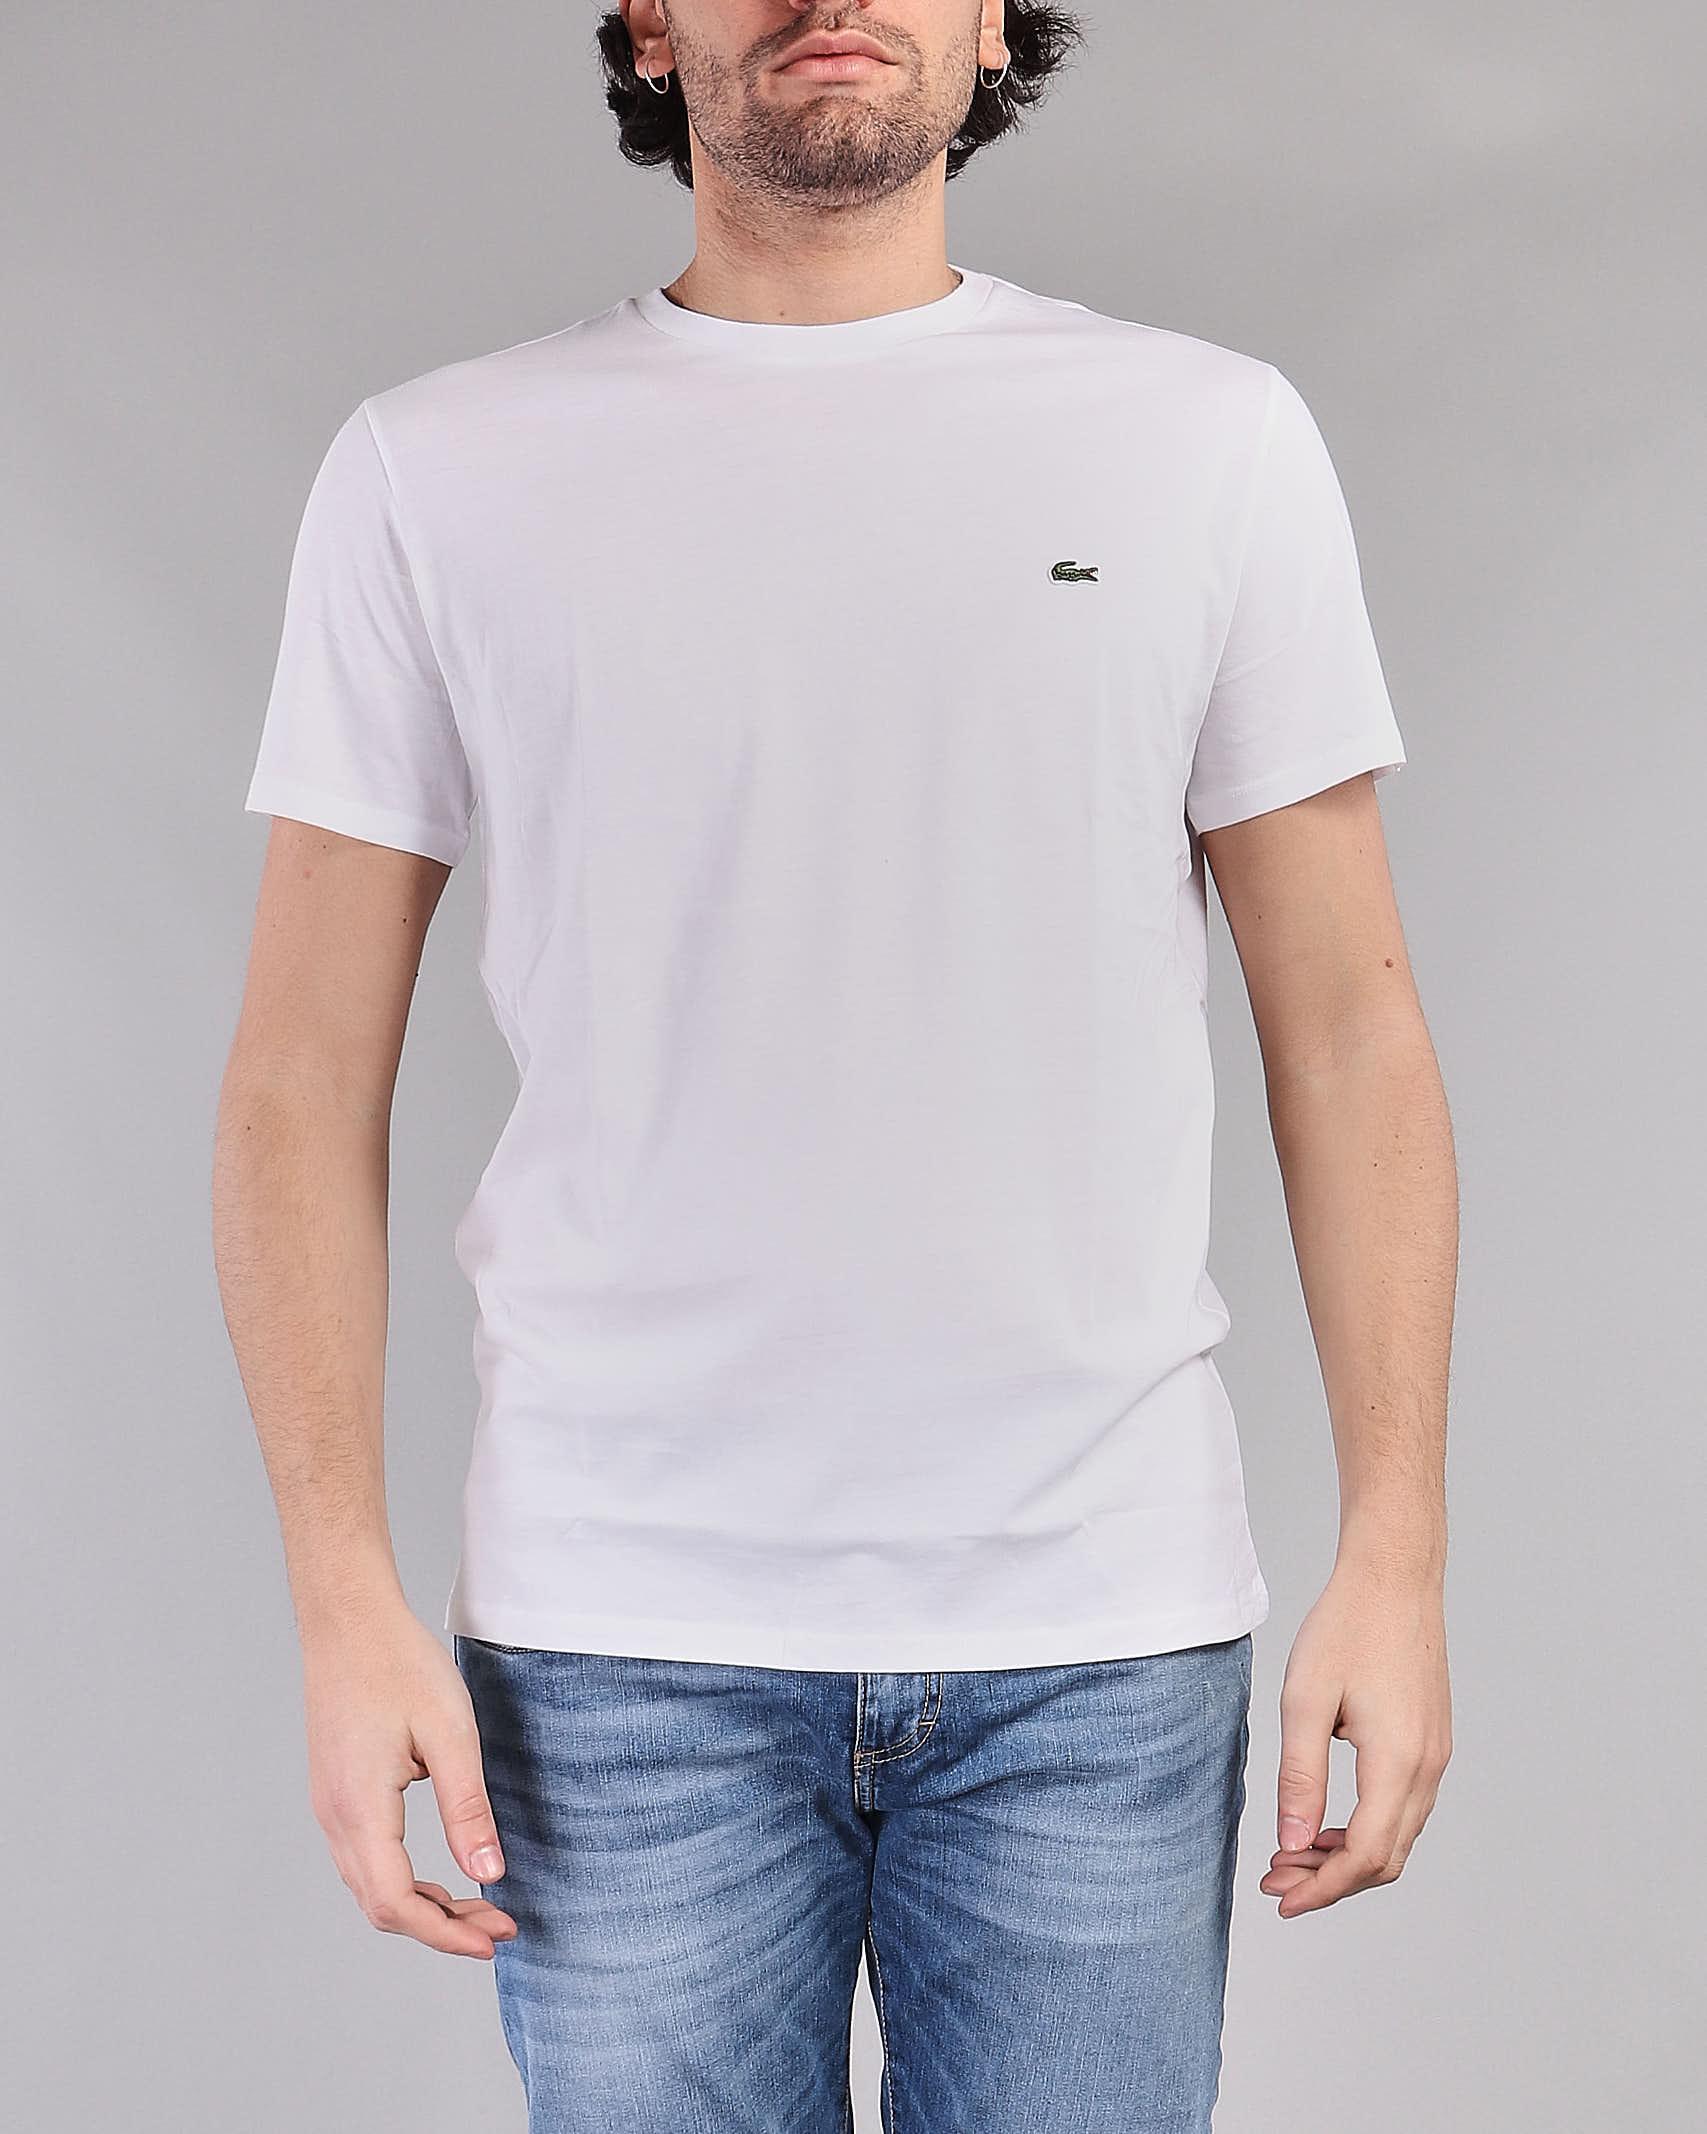 T-shirt in jersey di cotone Pima Lacoste LACOSTE | T-shirt | TH6709001